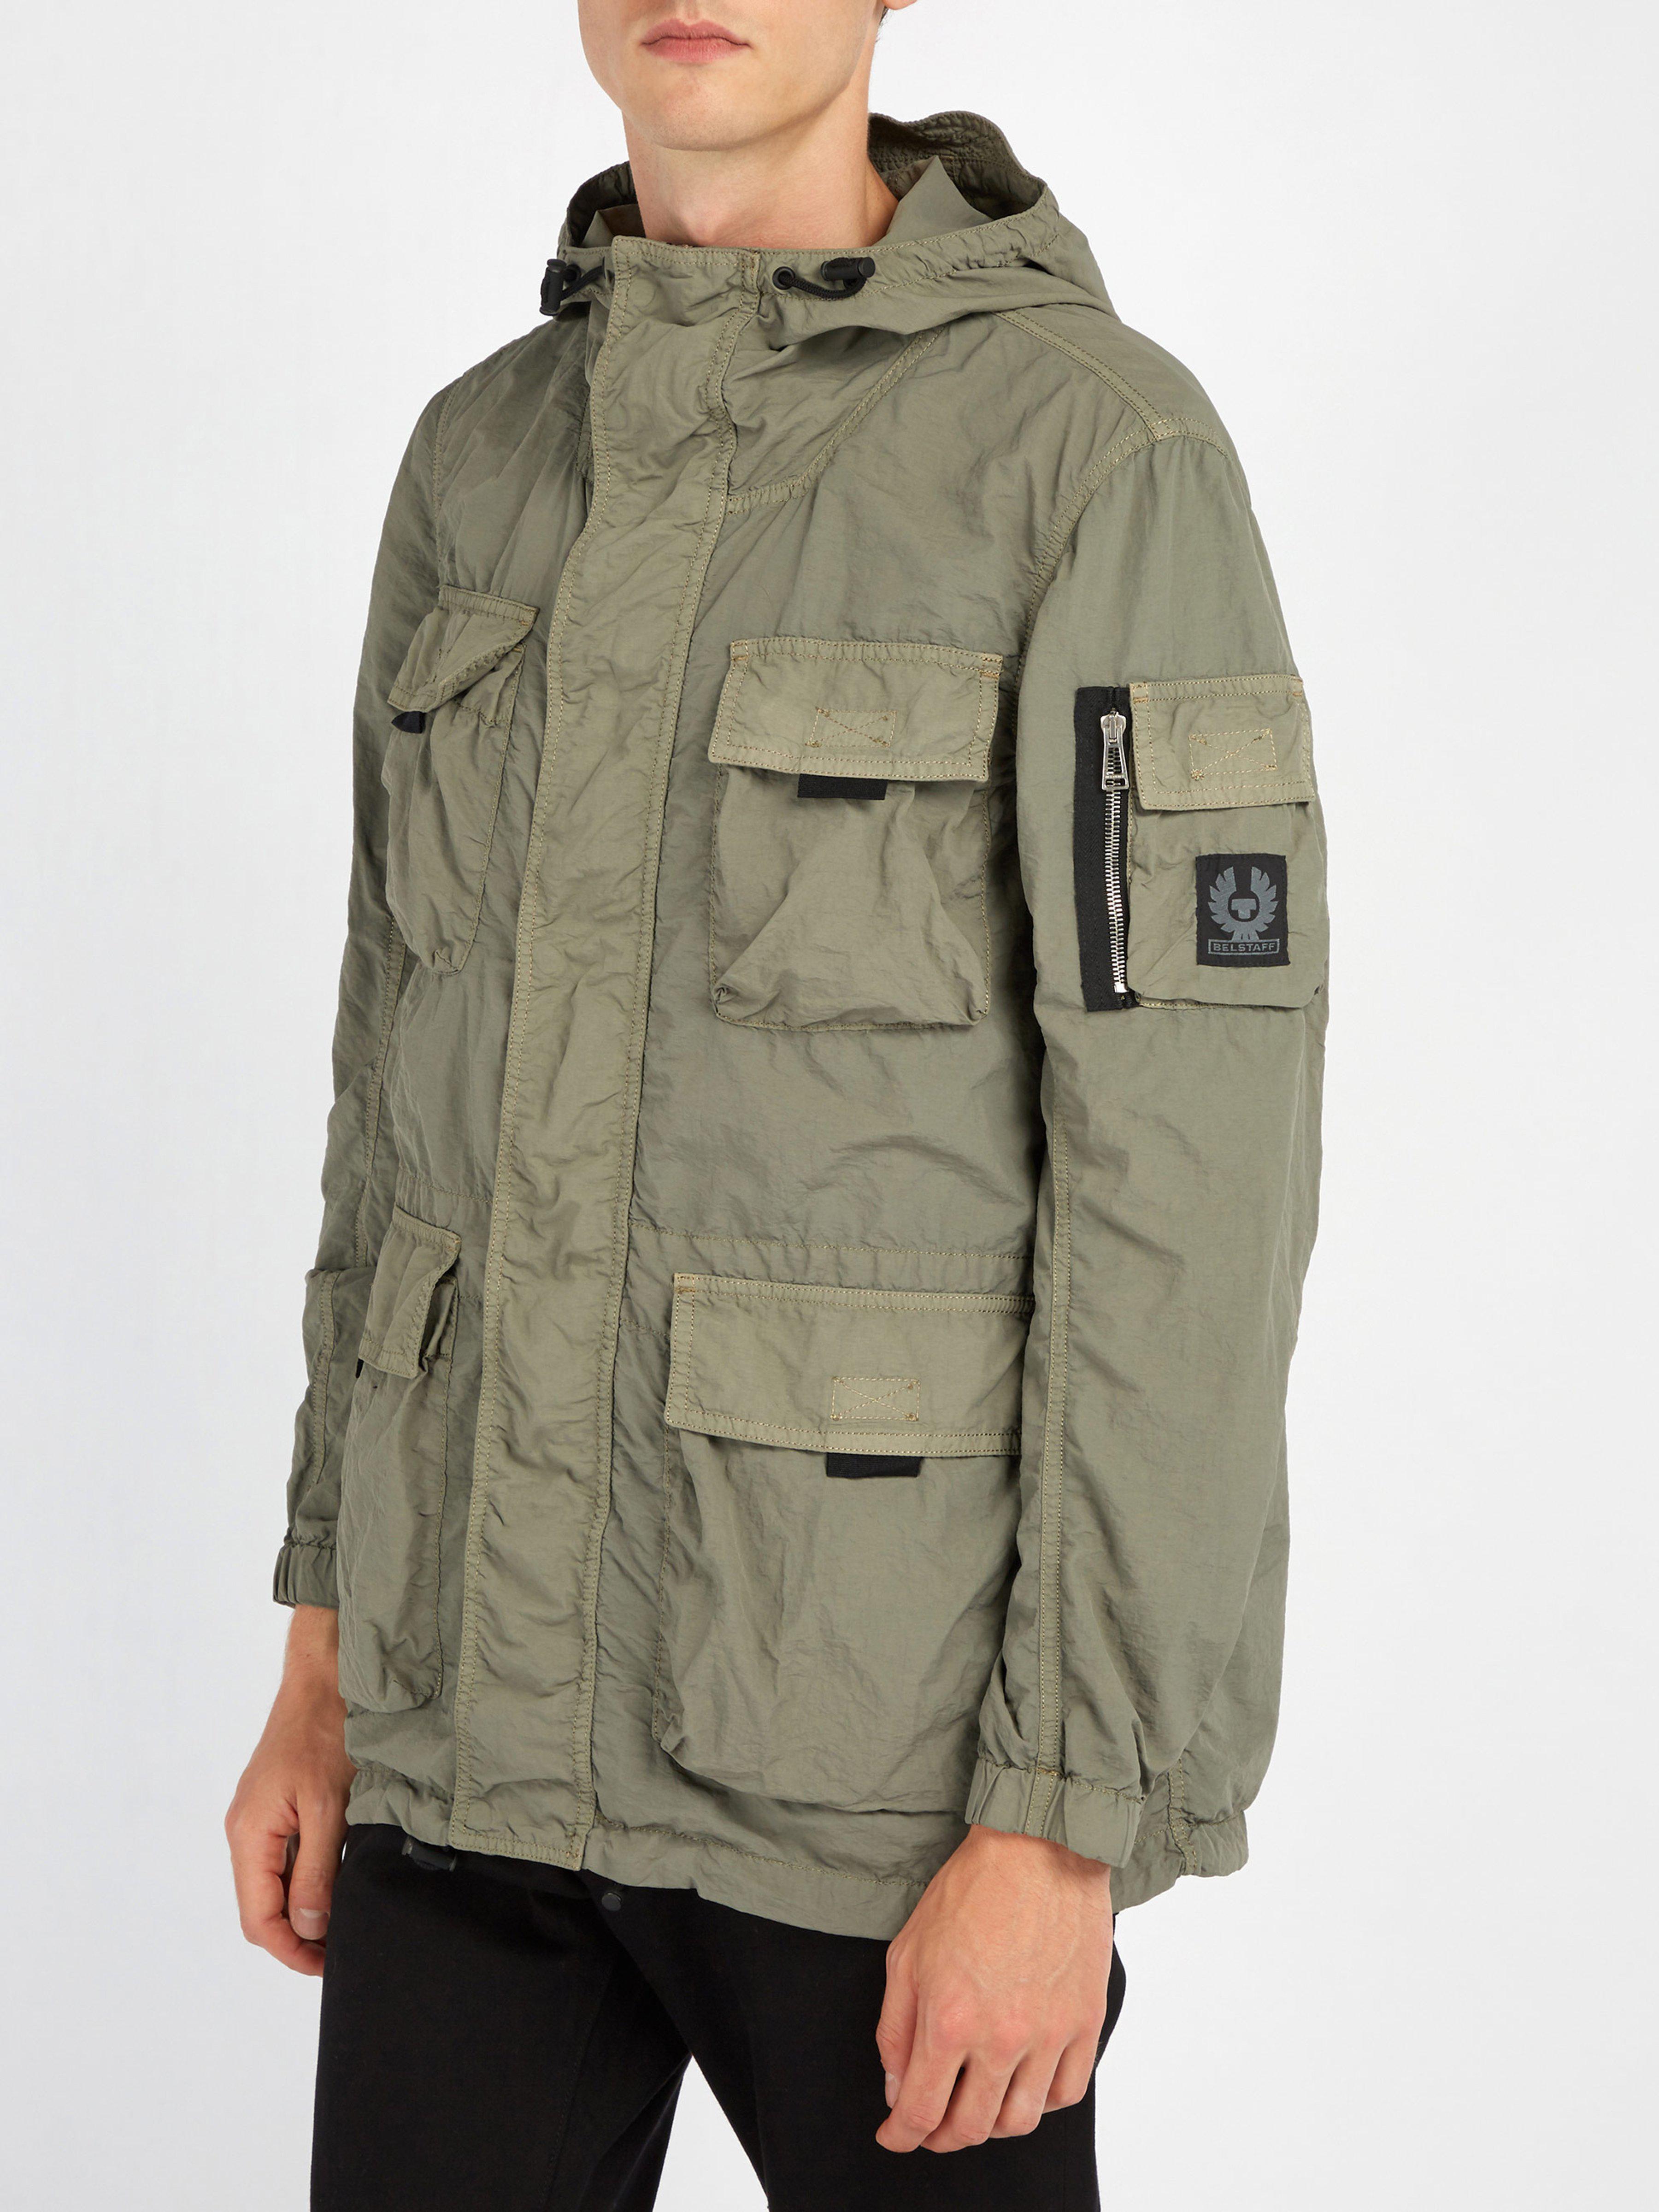 bbf1234571 Belstaff Pallington Double-layered Lightweight Jacket in Green for ...